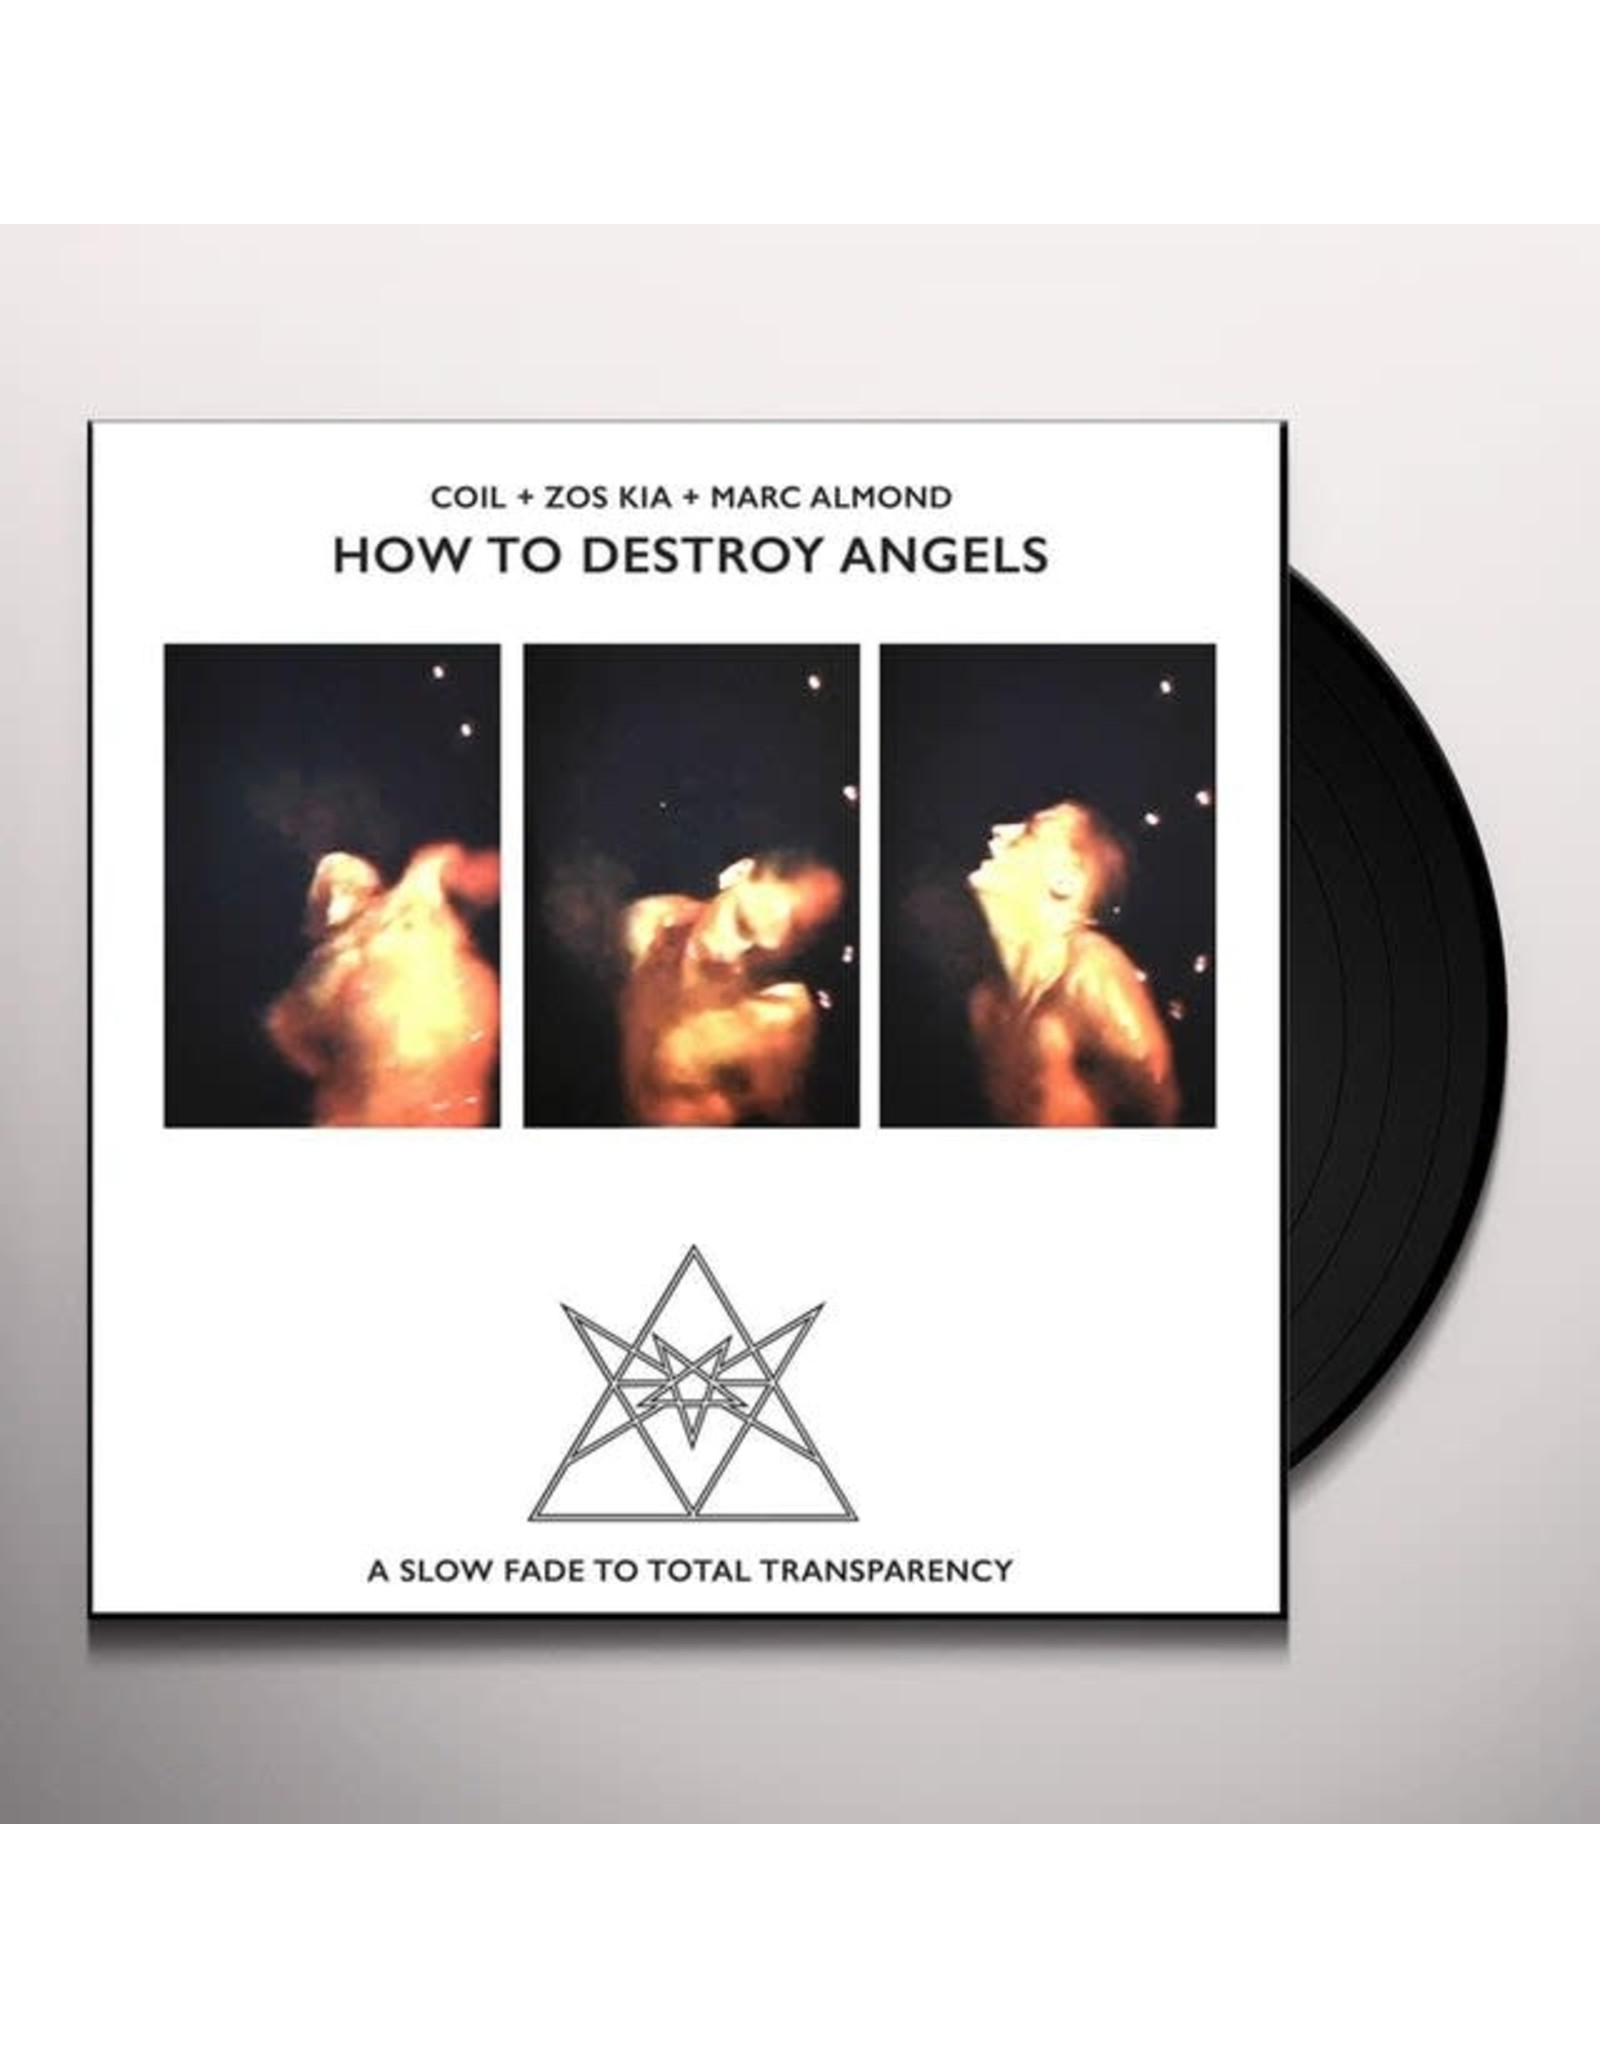 New Vinyl Coil + Zos Kia + Marc Almond - How To Destroy Angels LP